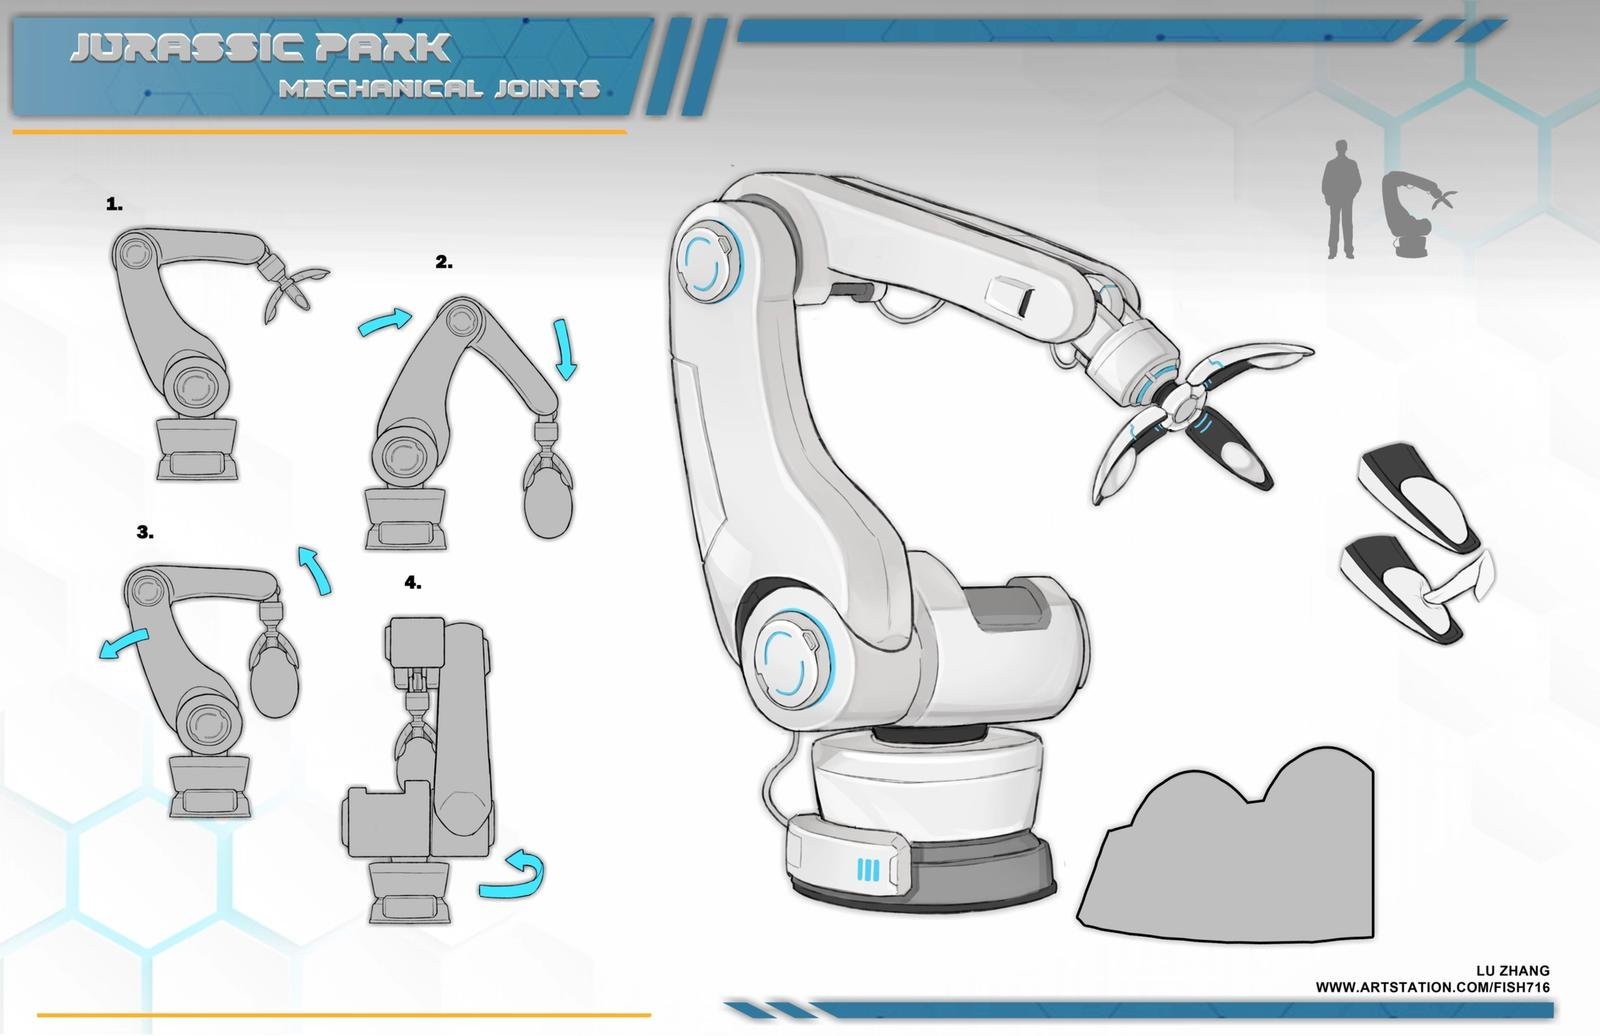 Mechanical Joints - Jurrassic Park